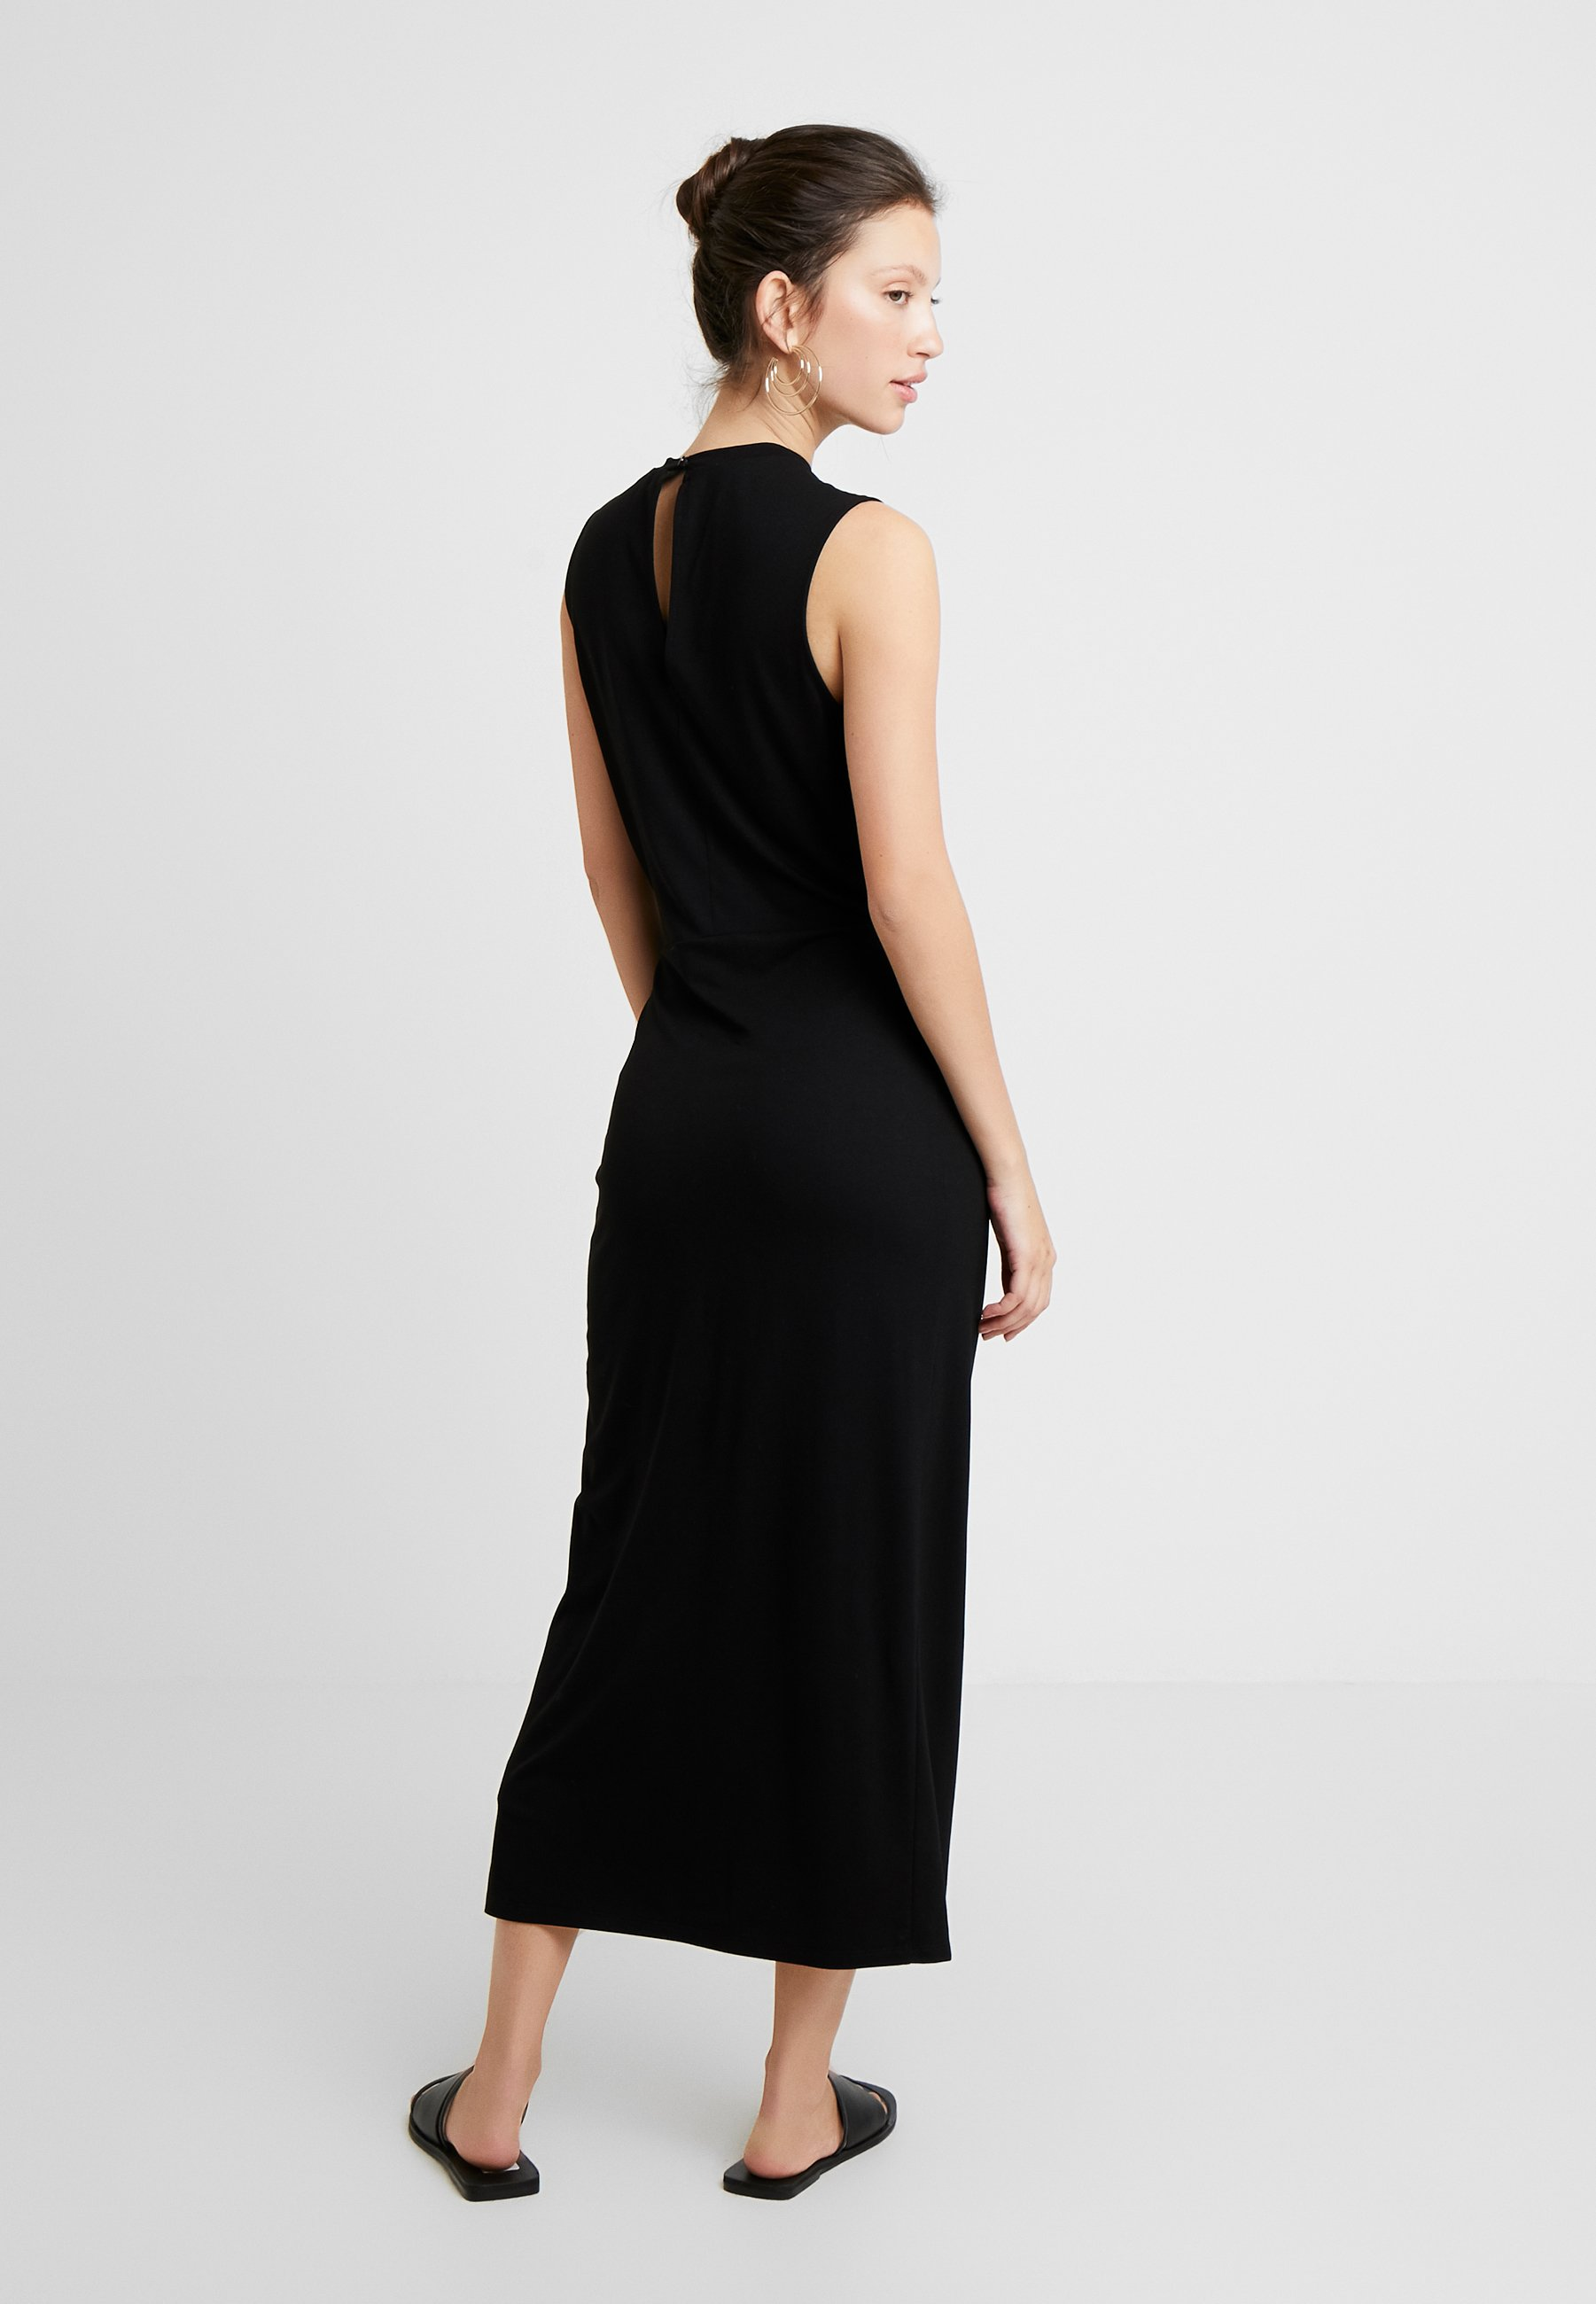 Black Edited En Nadine Jersey DressRobe rdBCxeo